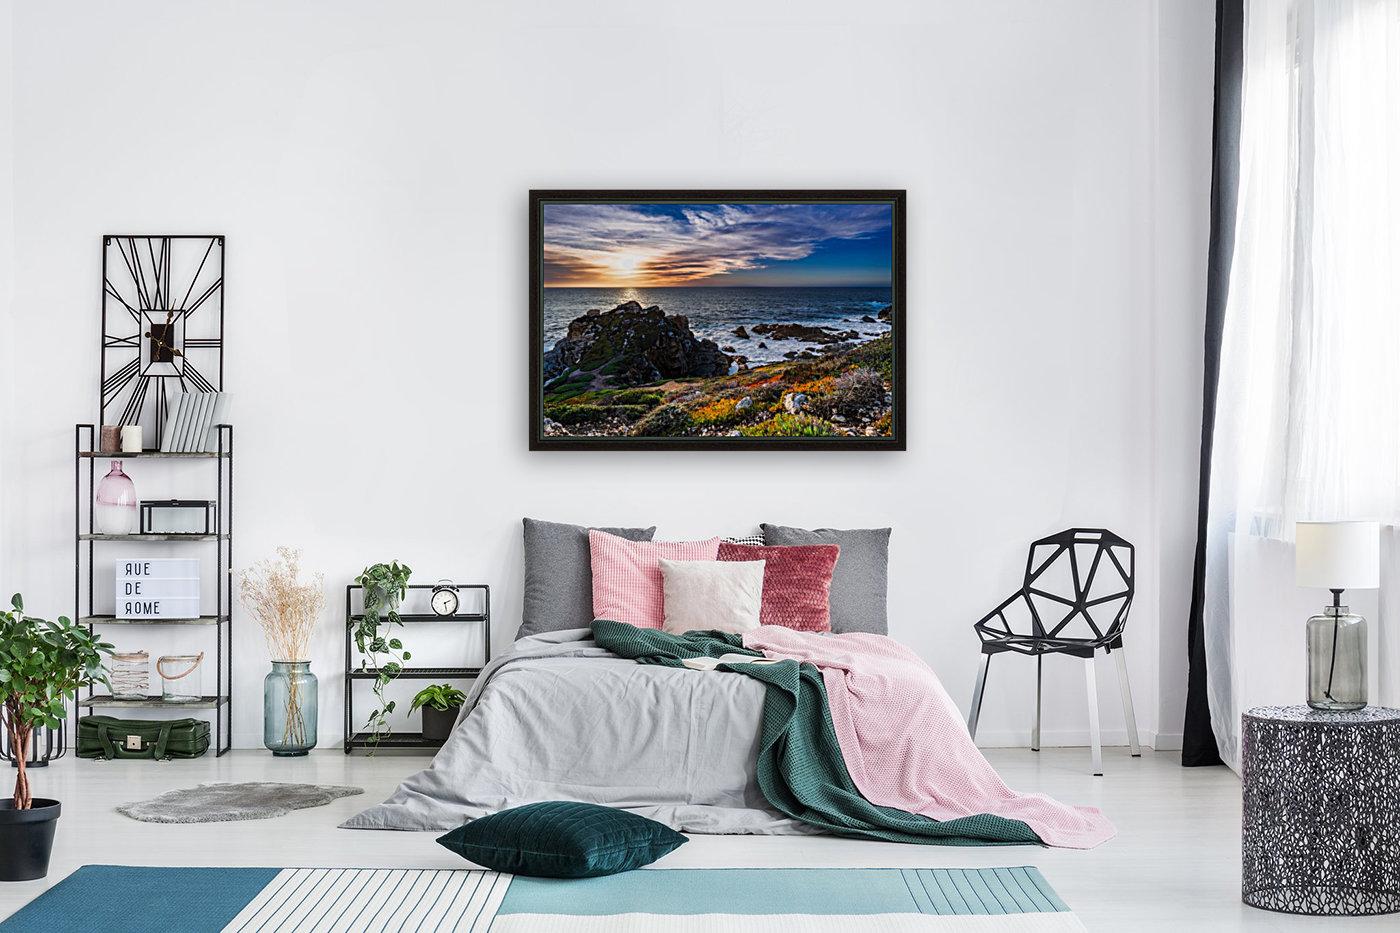 sea, seashore, water, nature, sky, blue, summer, landscape, colorful, clouds, sunset, outdoor,  Art